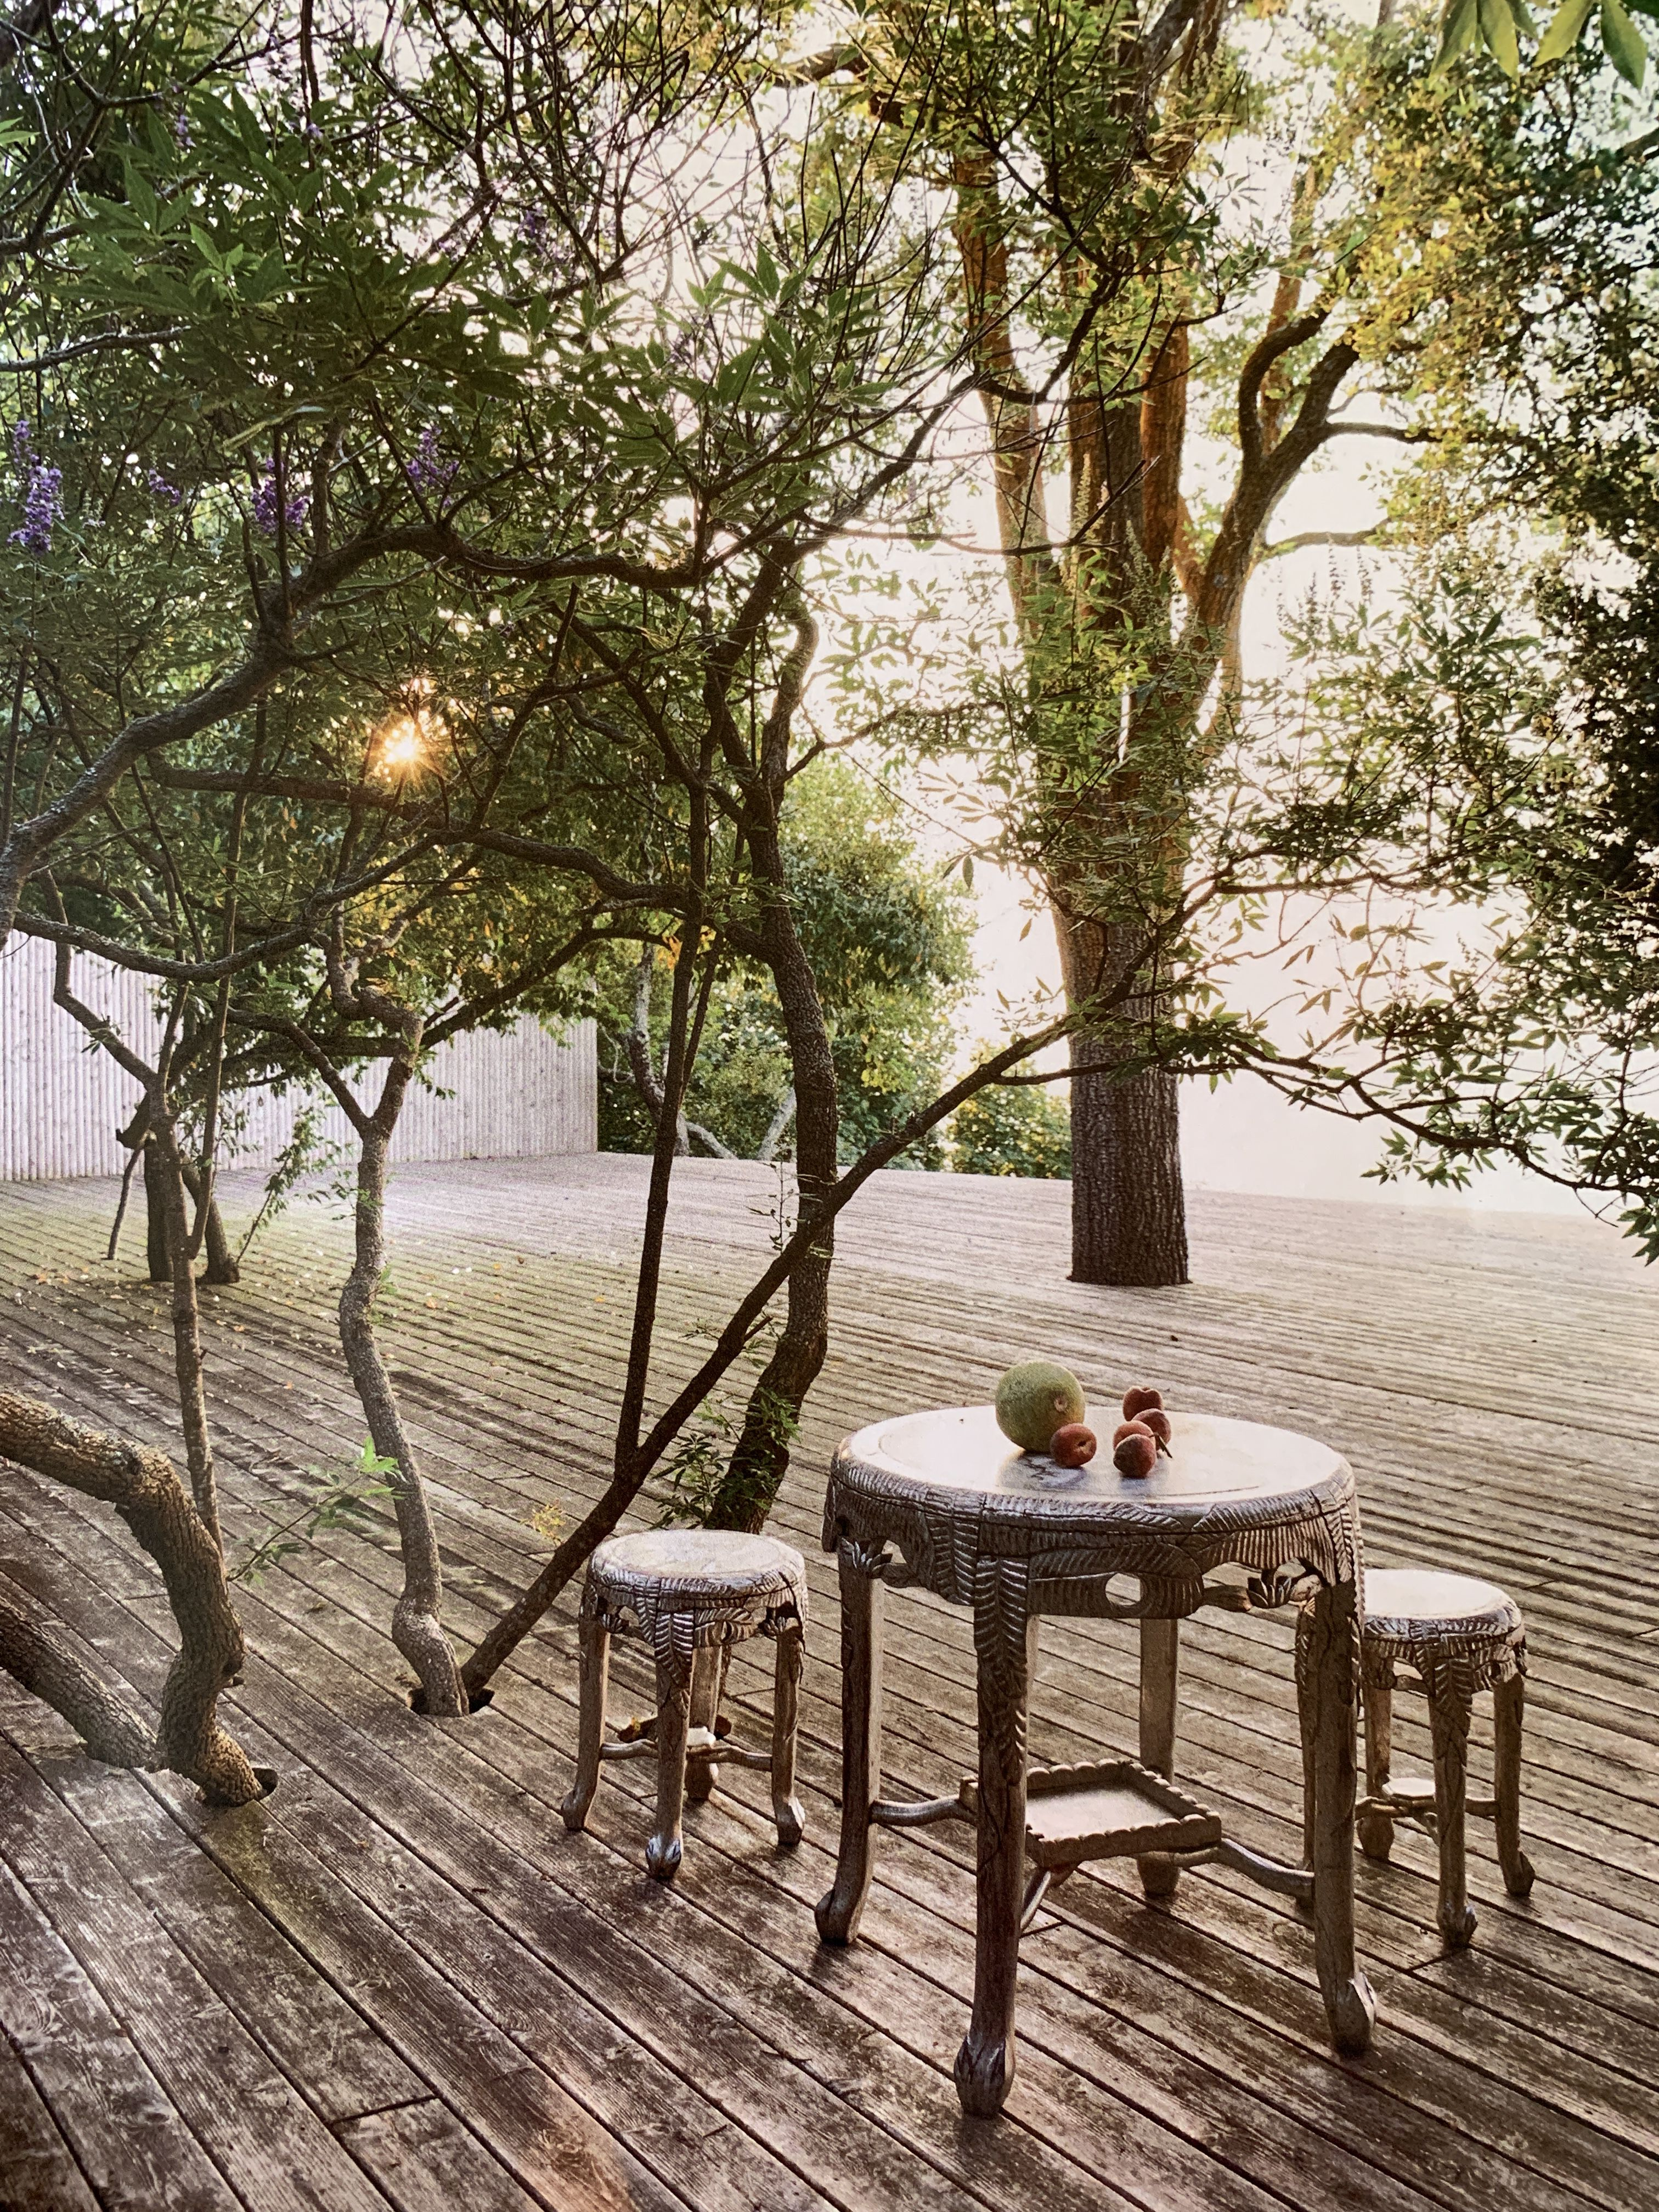 Arch Digest Dec. 2018 Outdoor furniture sets, Outdoor